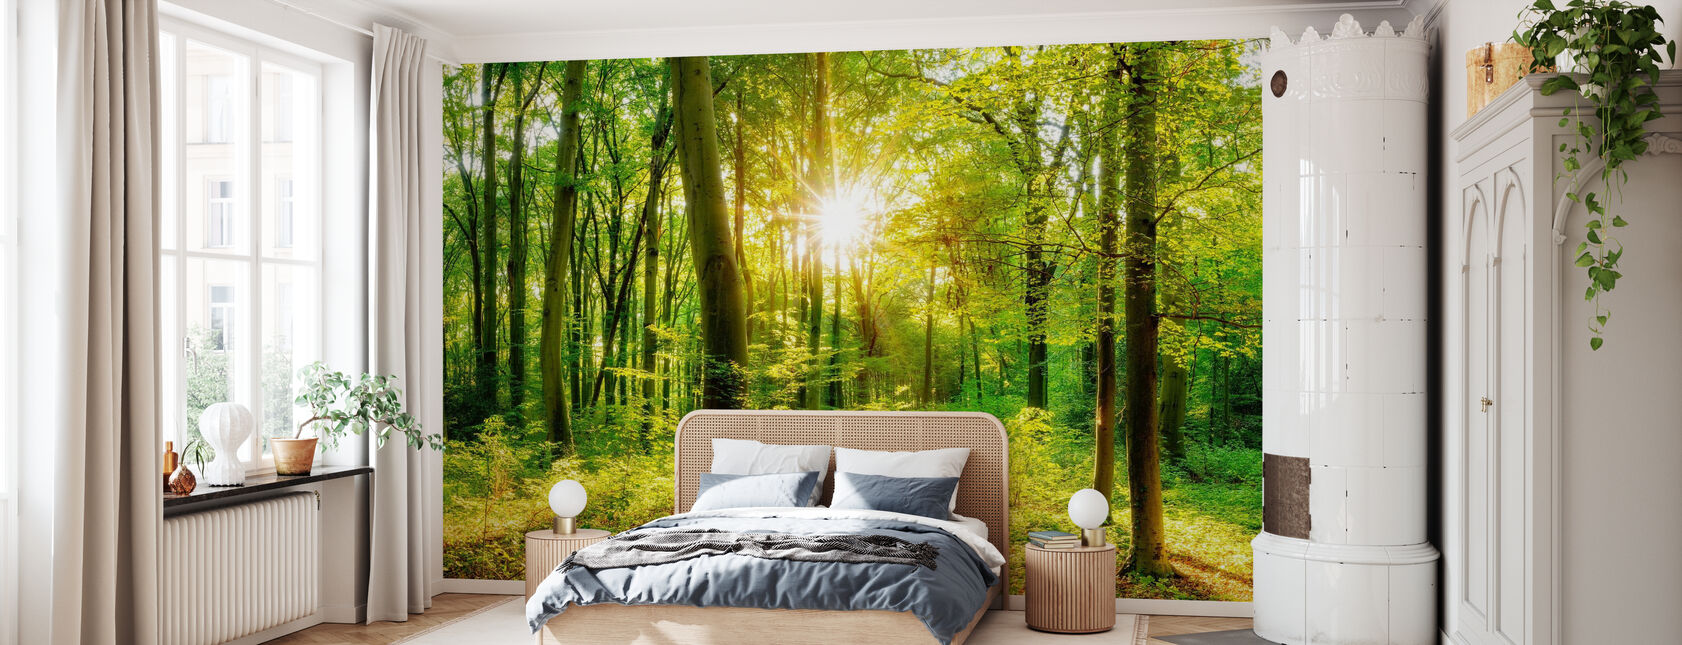 Let it Shine - Wallpaper - Bedroom